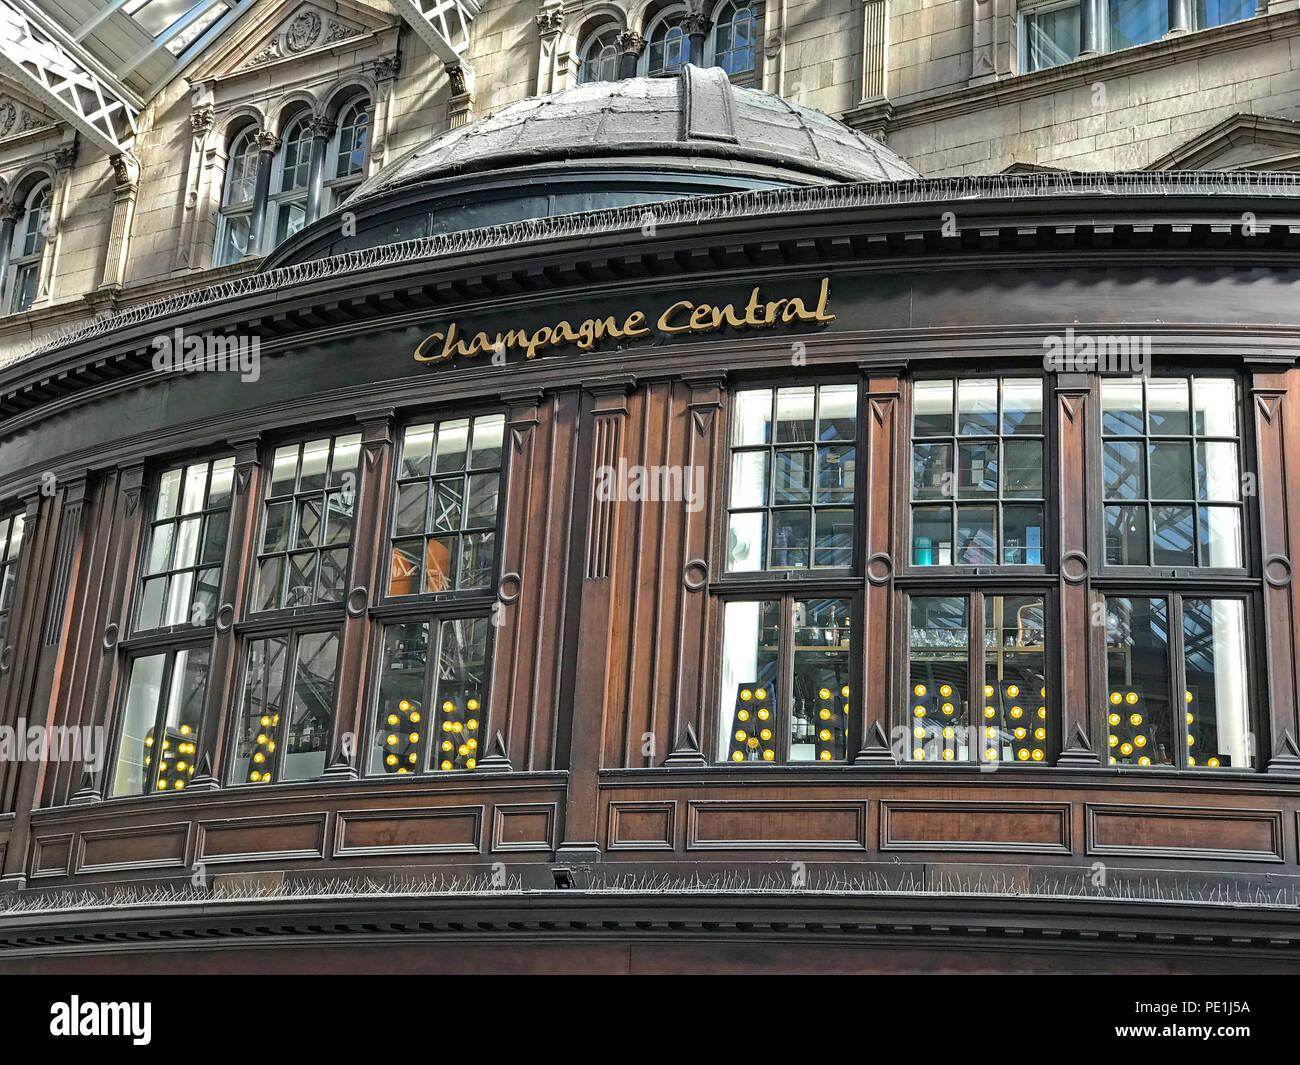 Champagne Central bar, Gordon St, Glasgow, Scotland UK - Stock Image